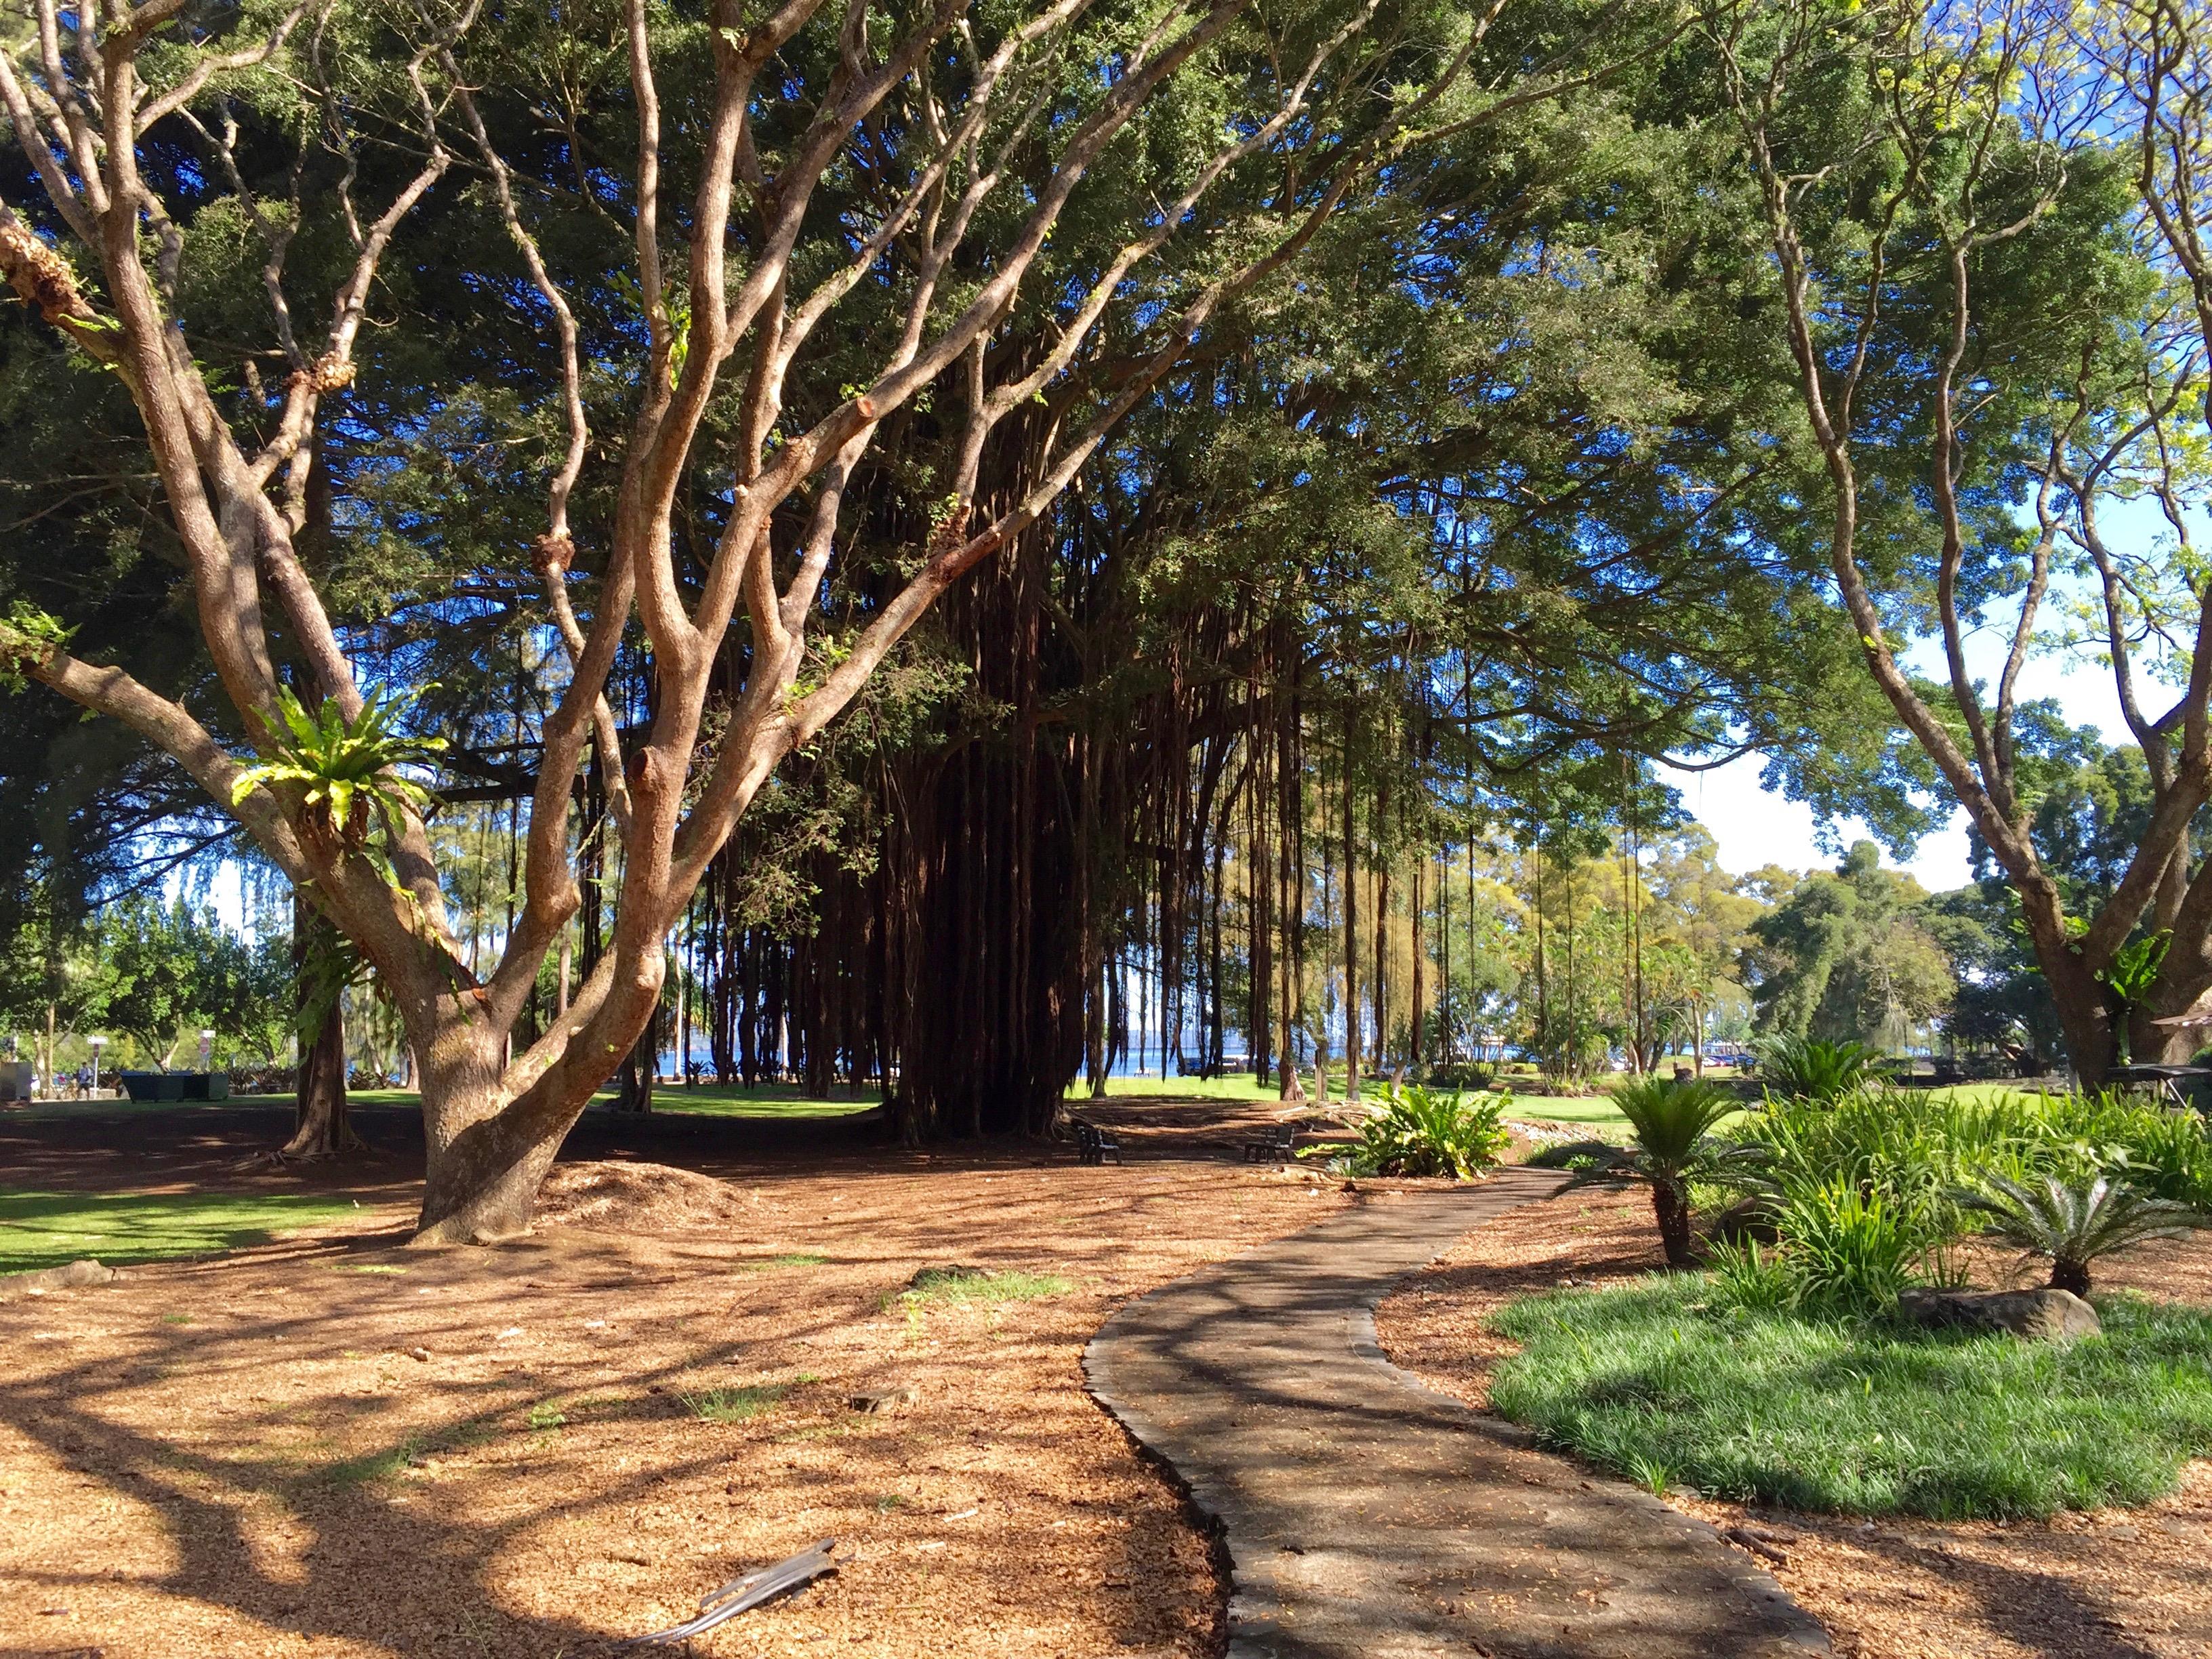 Liliuokalani Gardens: An Oasis in Time | Sandra Wagner-Wright